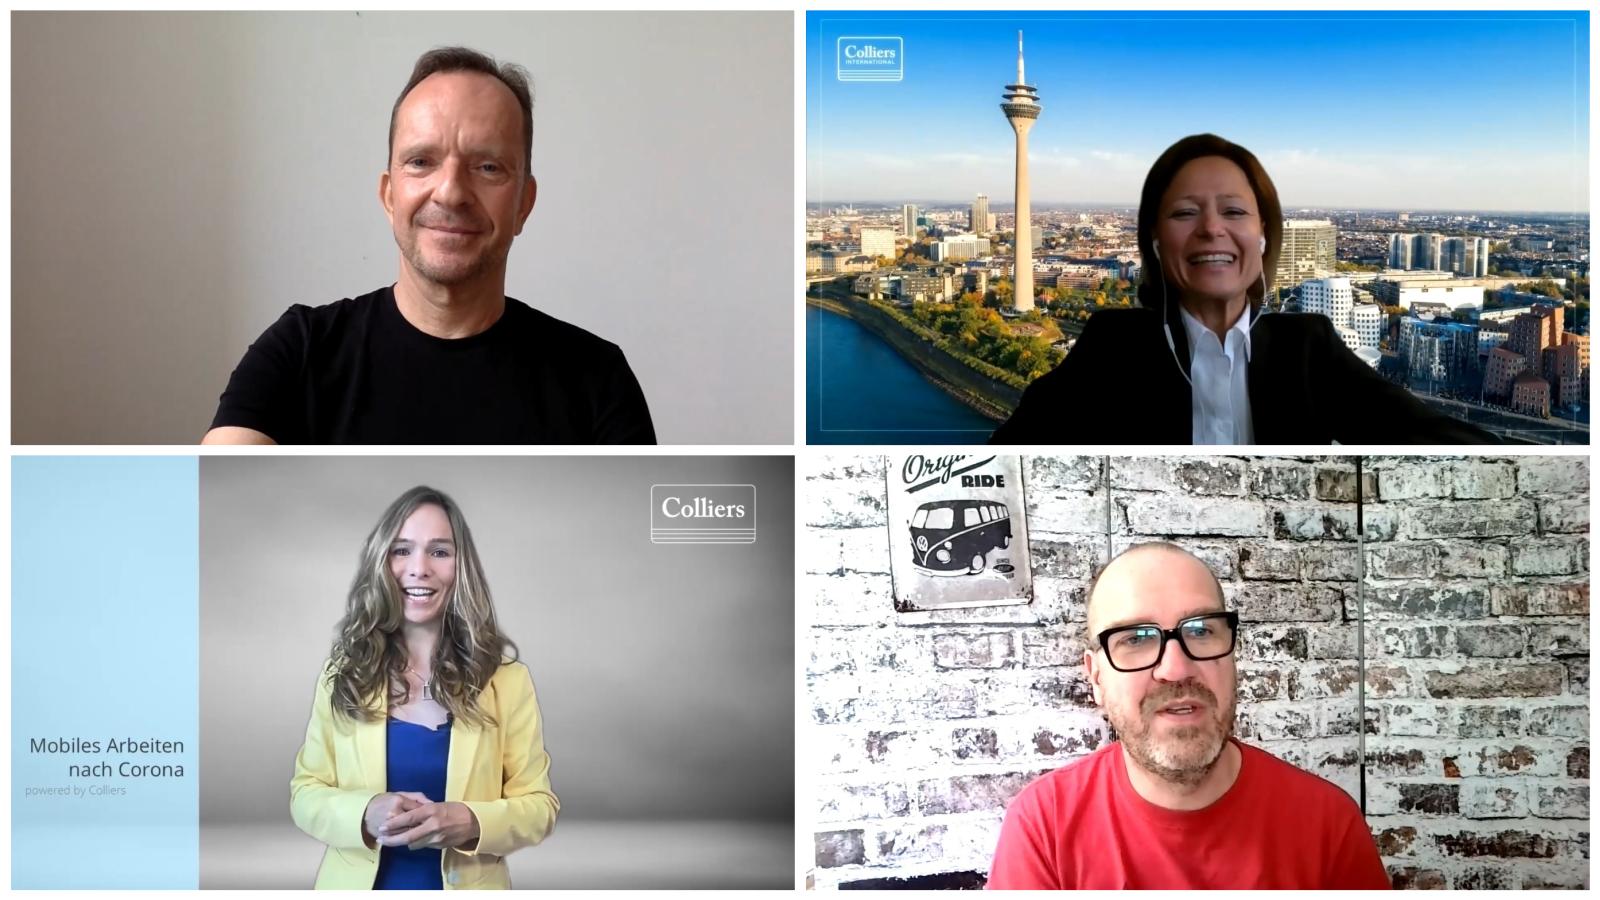 Web-Talk im Video: Mobiles Arbeiten nach Corona